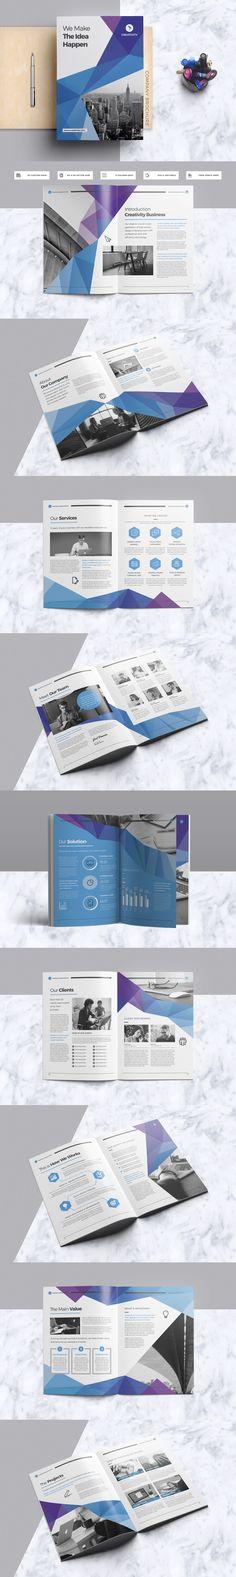 Bi Fold Business Brochure Template  Brochure  Flyer Designs